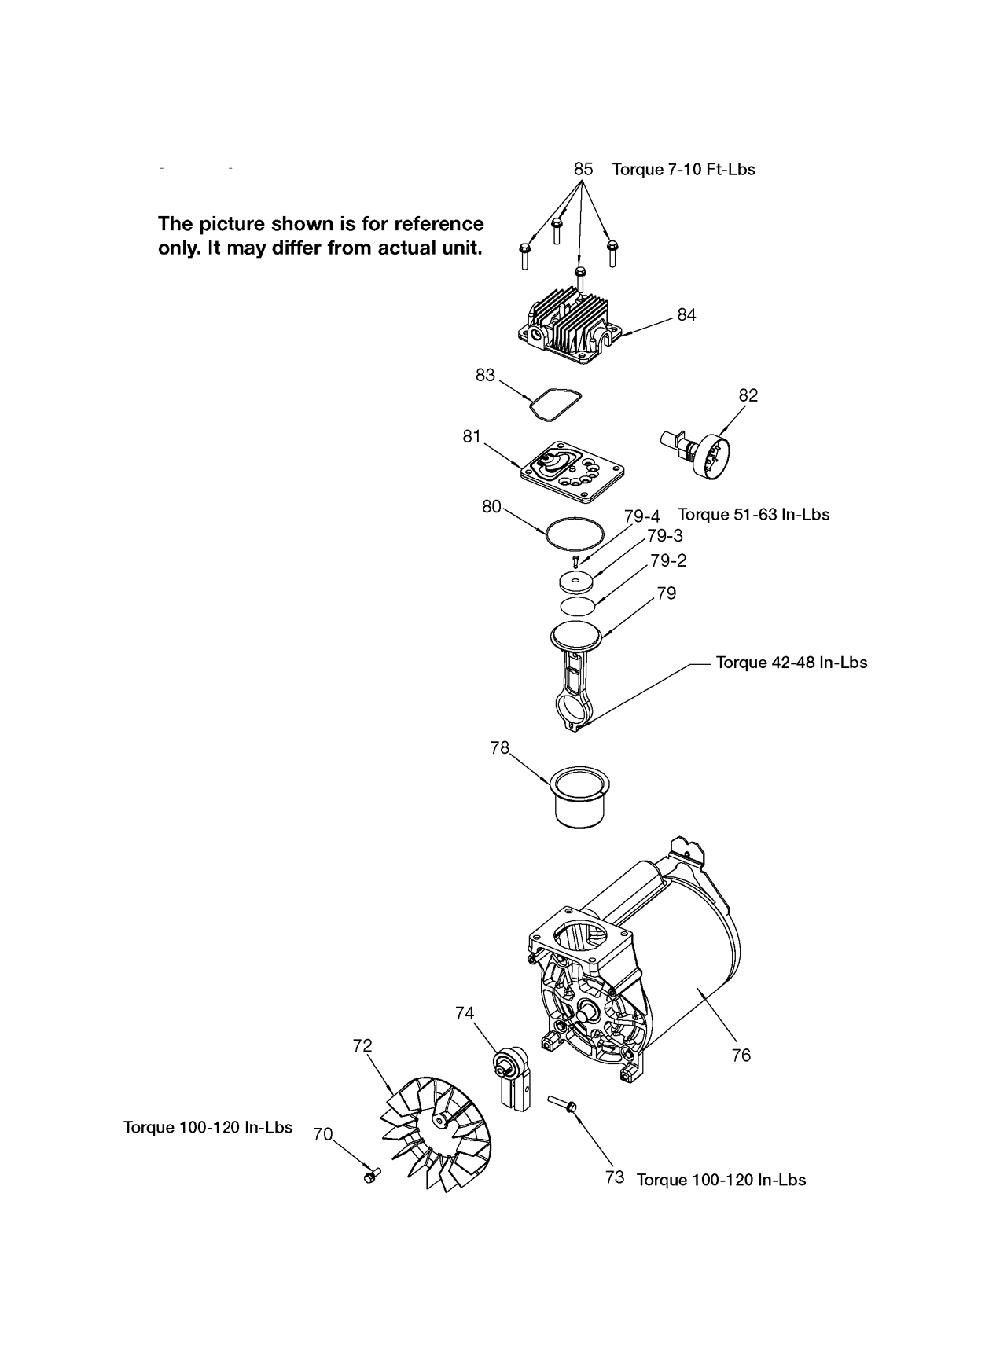 919-16721-Devilbiss-T0-PB-1Break Down